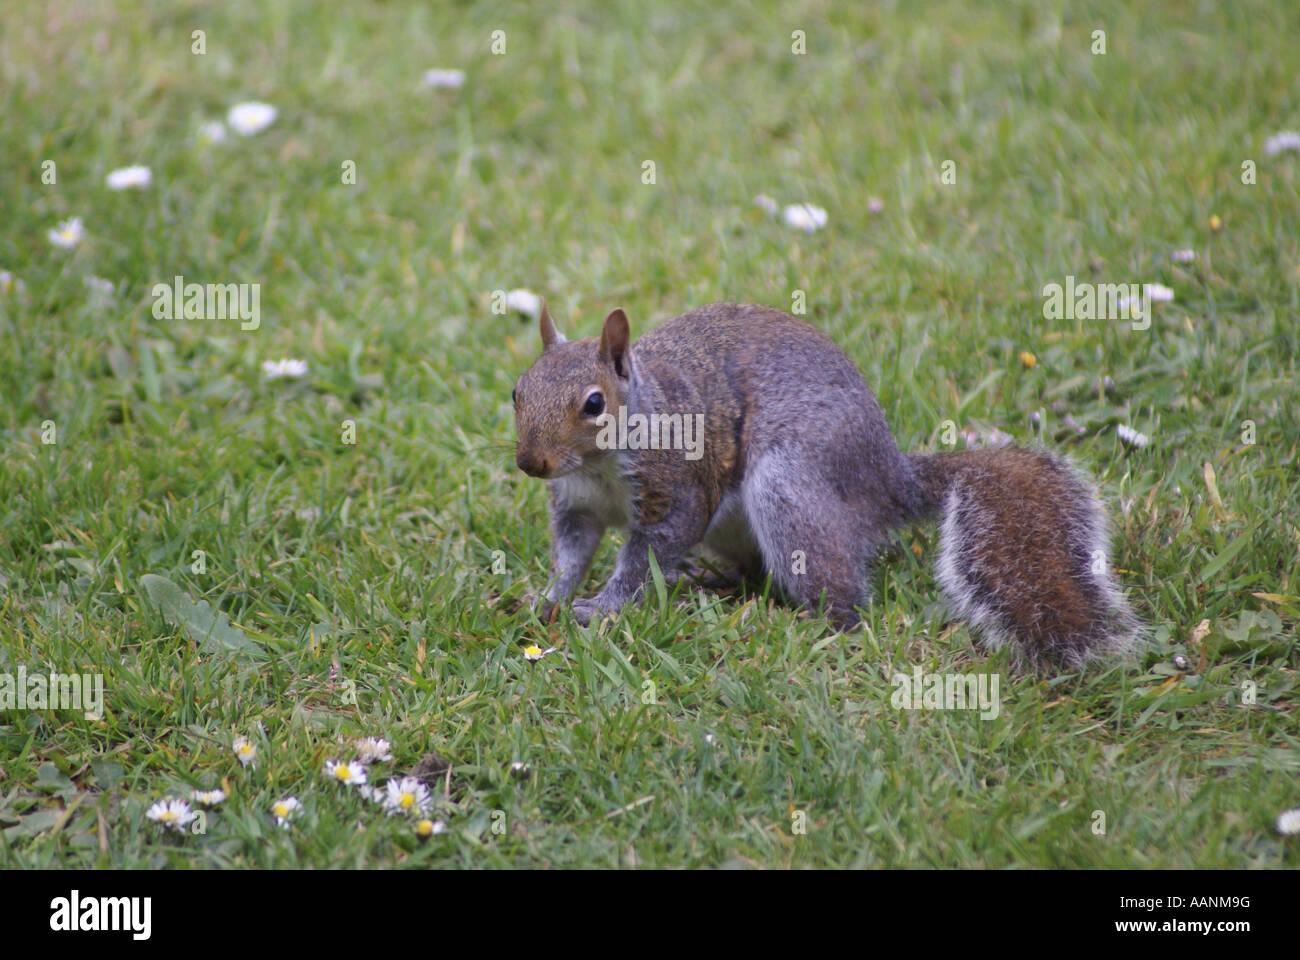 Graue Eichhörnchen Stockbild